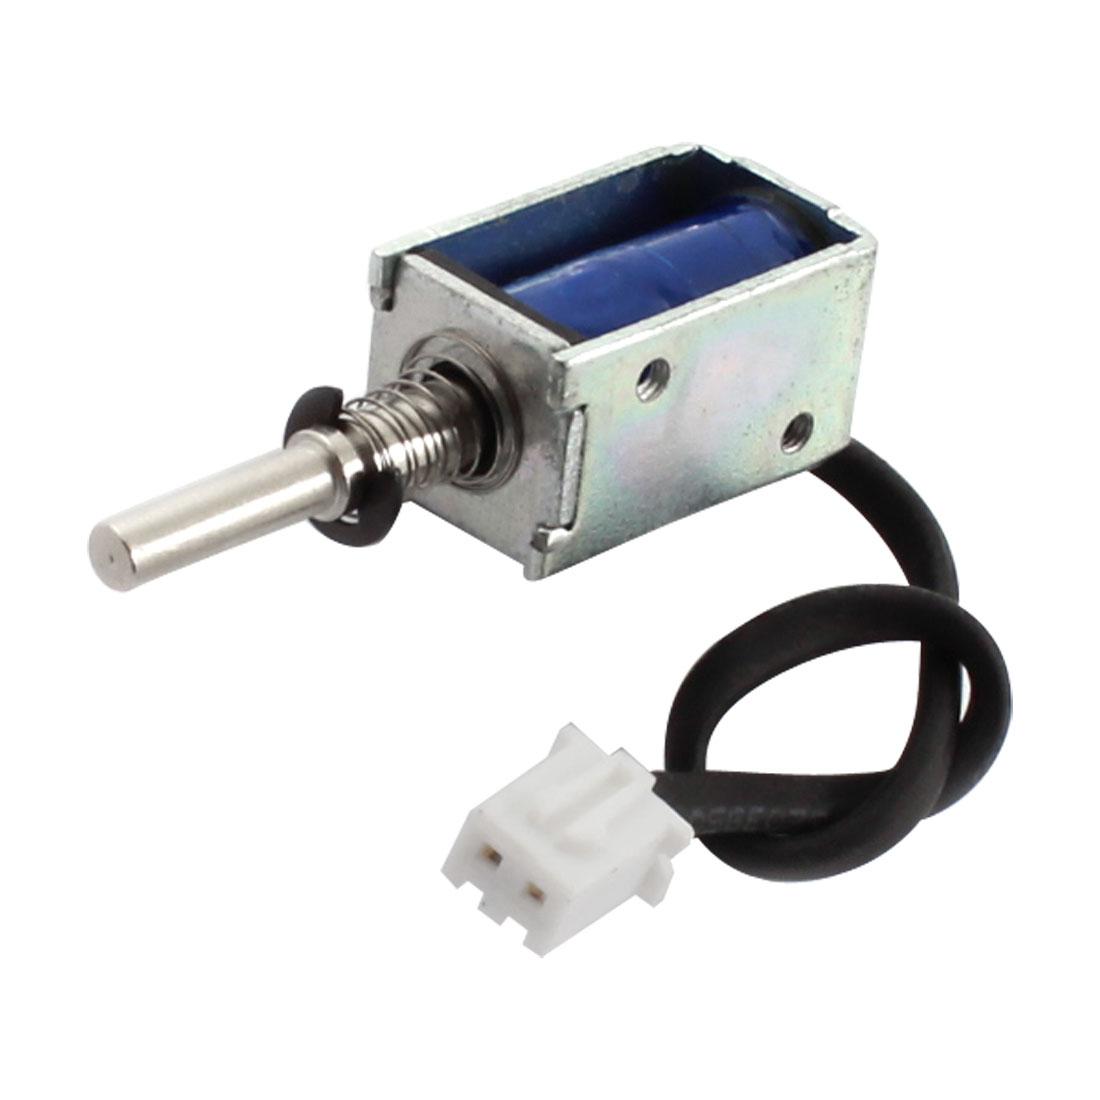 DC 12V 80g/3mm Open Frame Actuator Linear Push Pull Solenoid Electromagnet